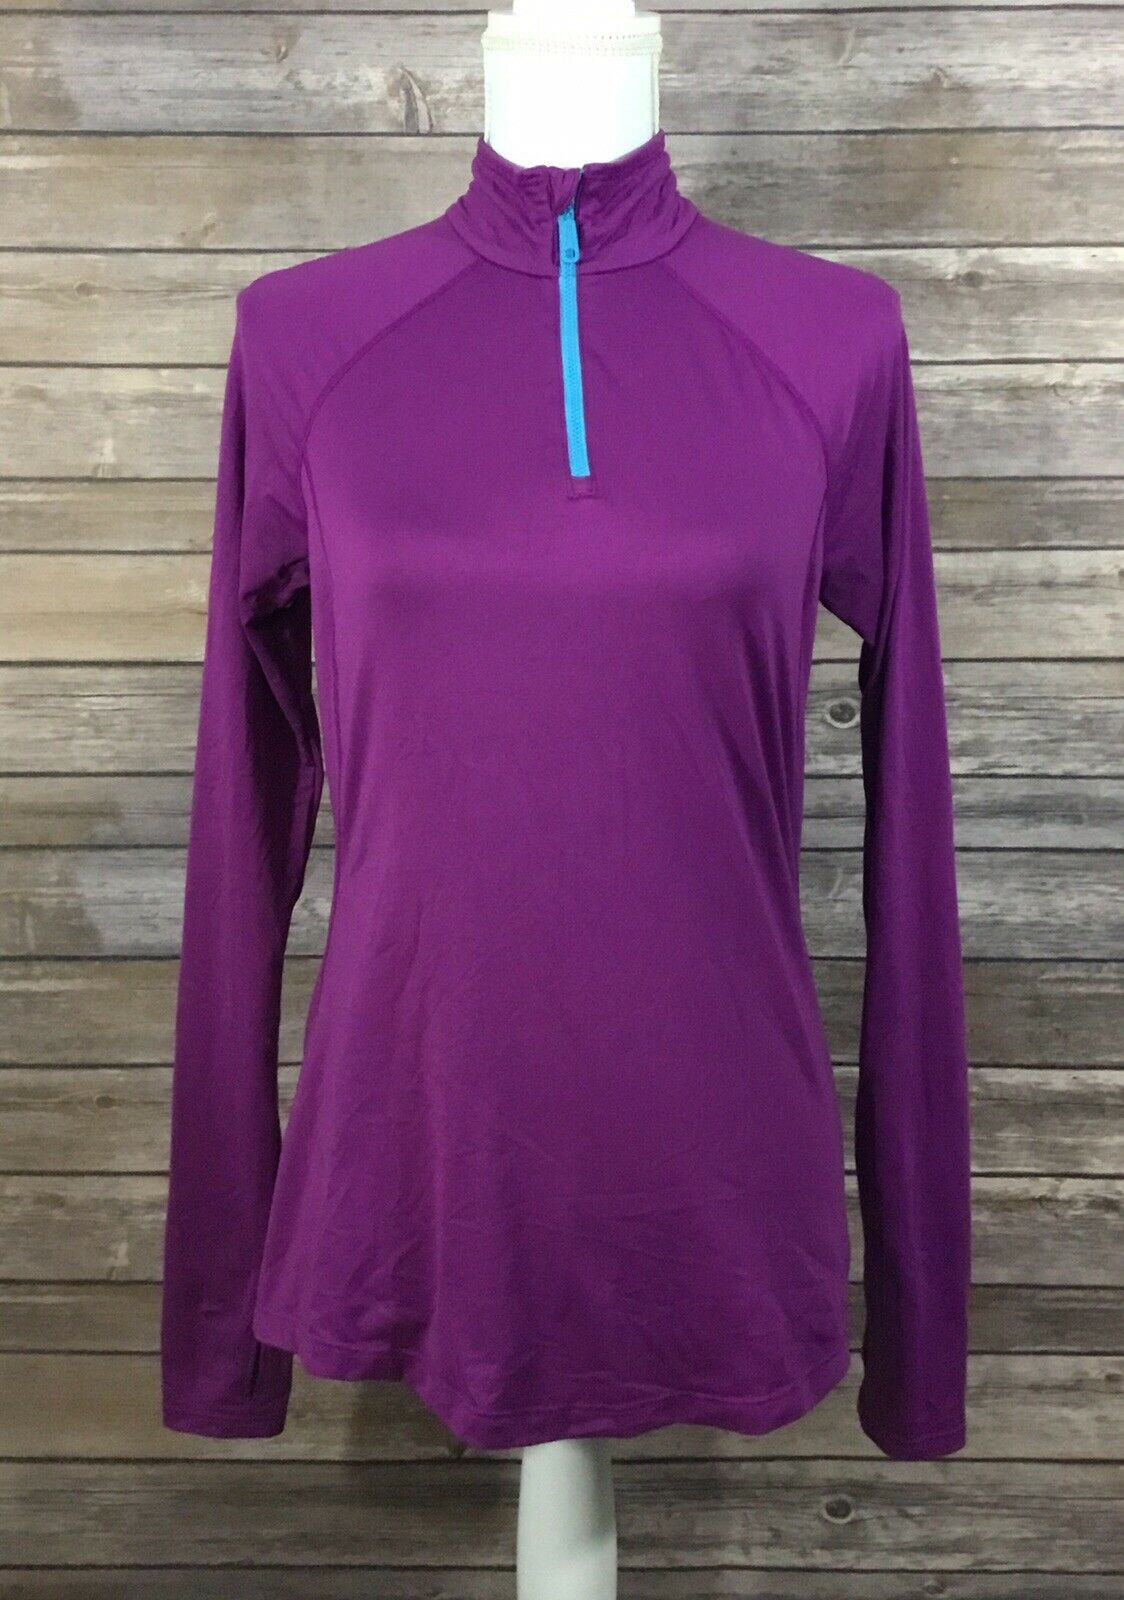 Mountain Hardwear Womens 1/4 Zip Butter Zippity Running Shirt Small Purple O49